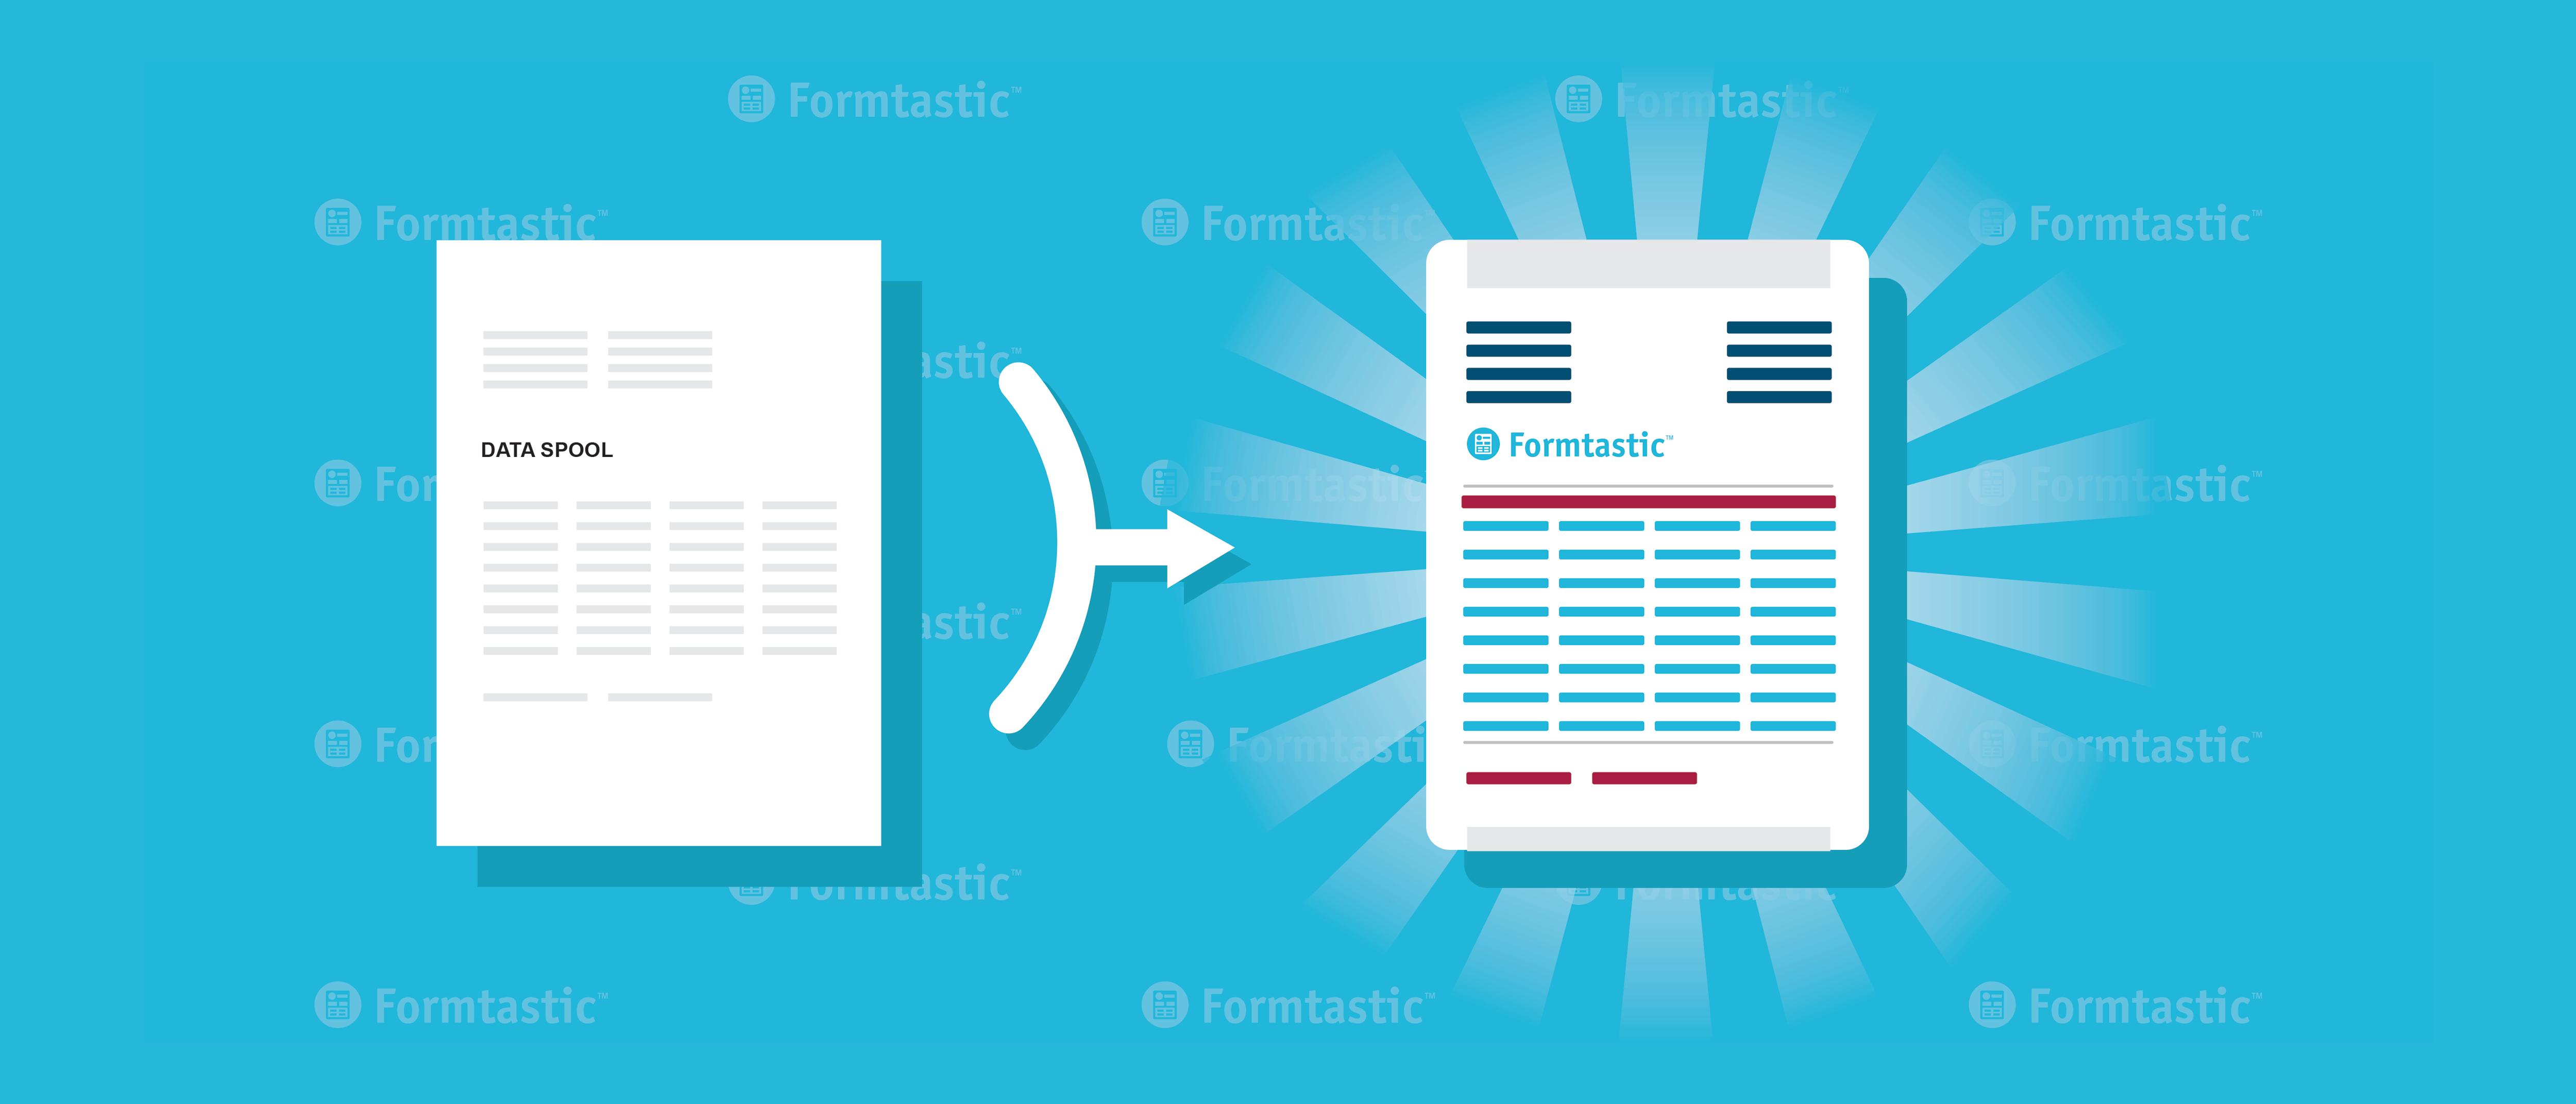 webinar-formtastic-cropped-2019